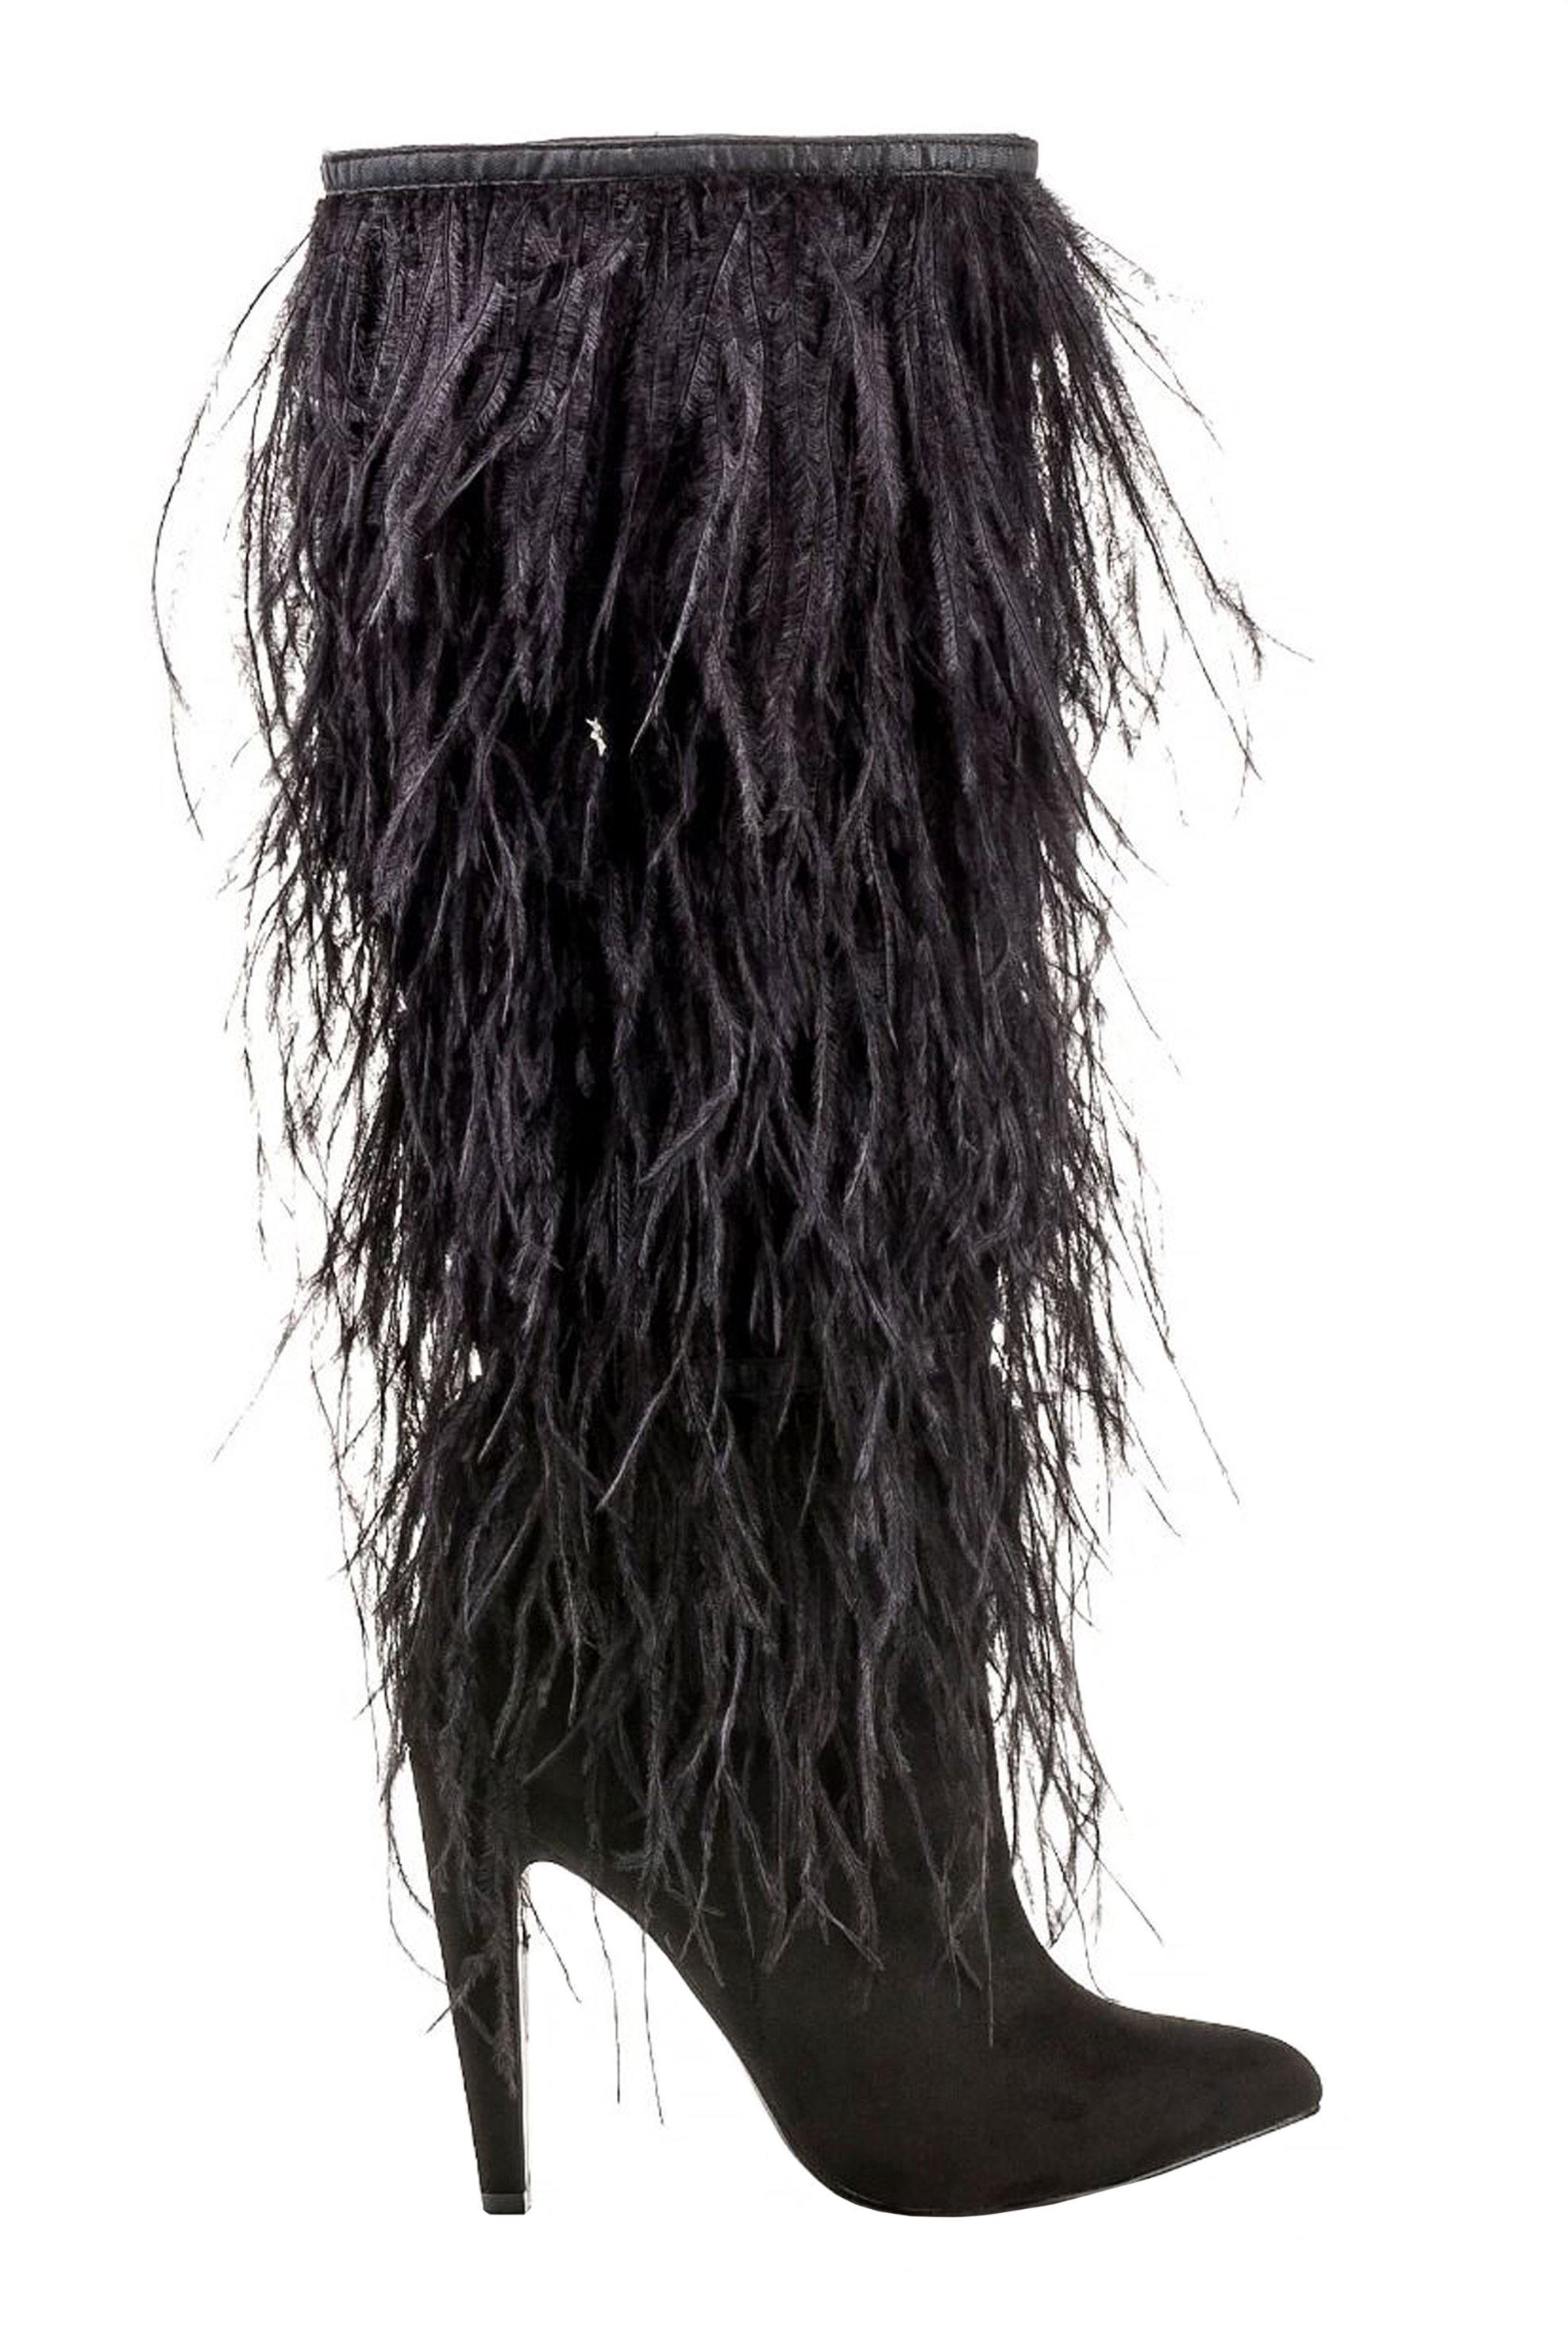 Steve Madden γυναικεία μποτά με φτερά - 218744-ALESANDRA - Μαύρο γυναικα   παπουτσια   μπότες   ως το γόνατο